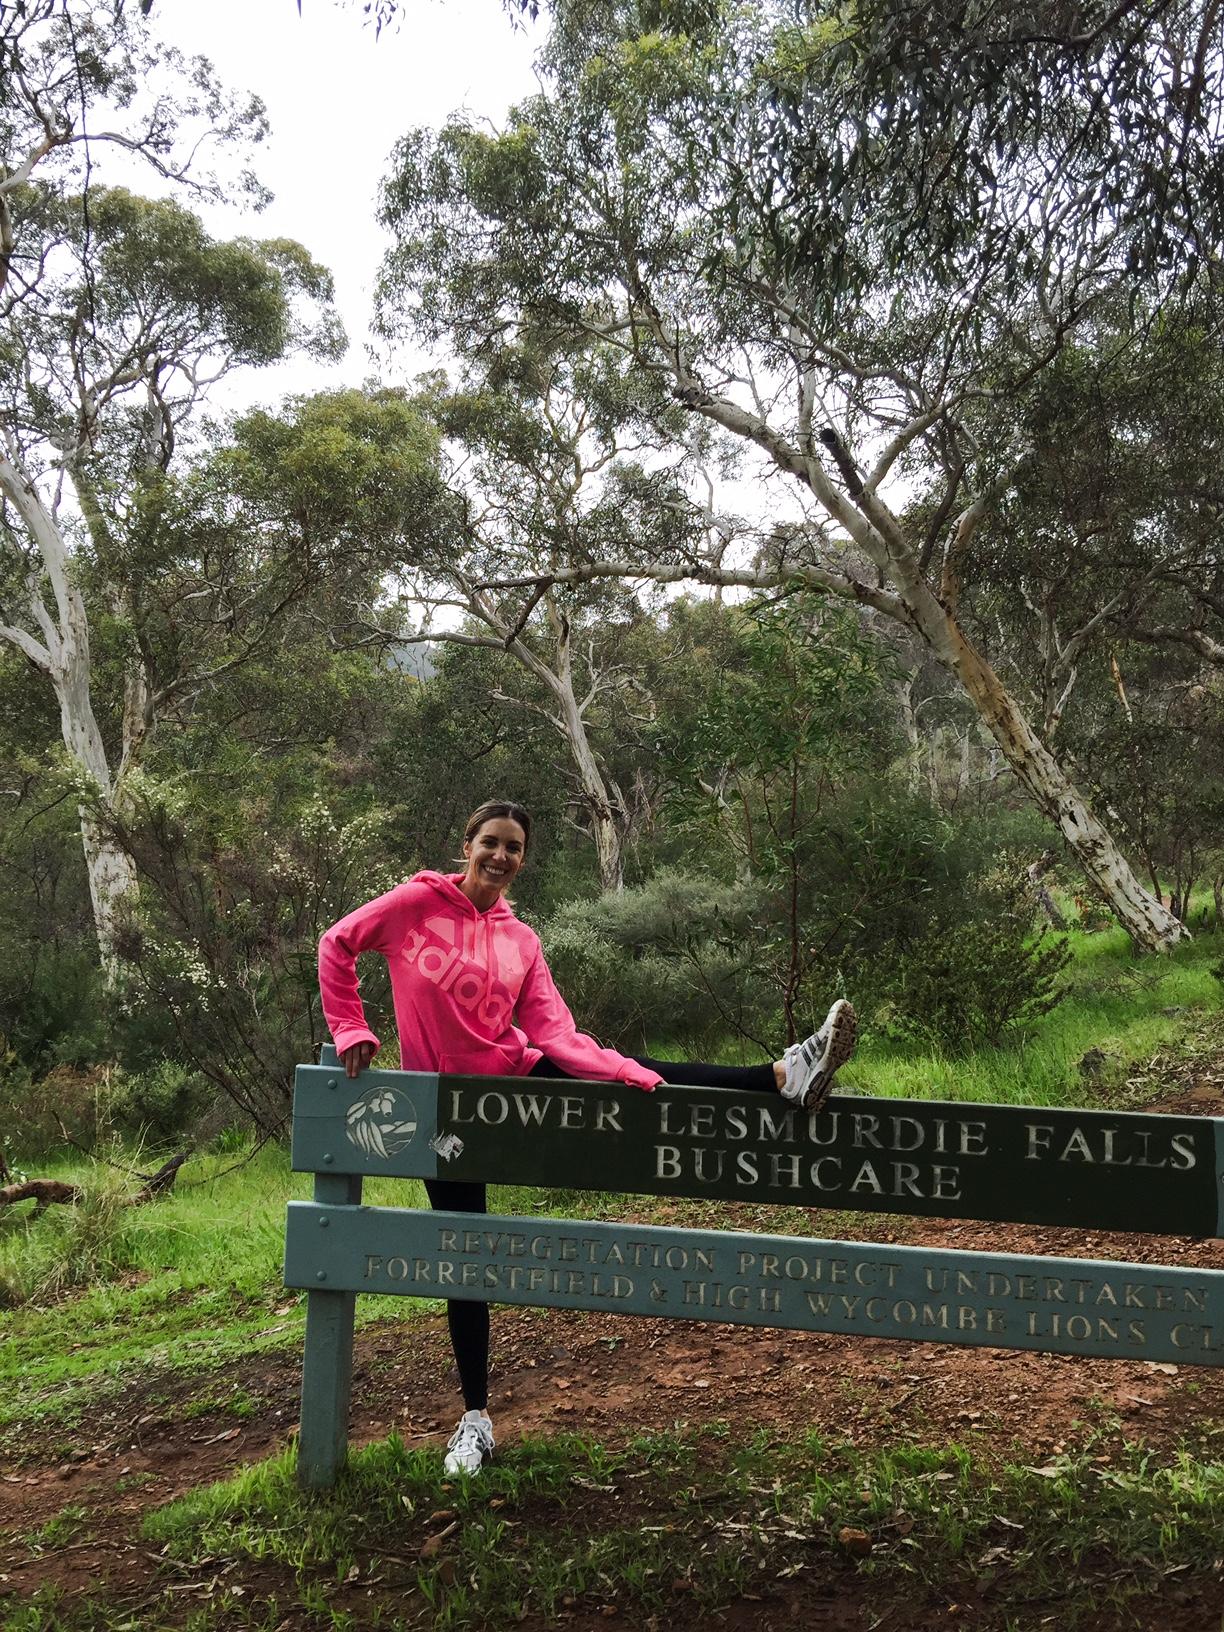 Chasing Waterfalls at Lesmurdie Falls - Perth Blogger Katie Rebekah